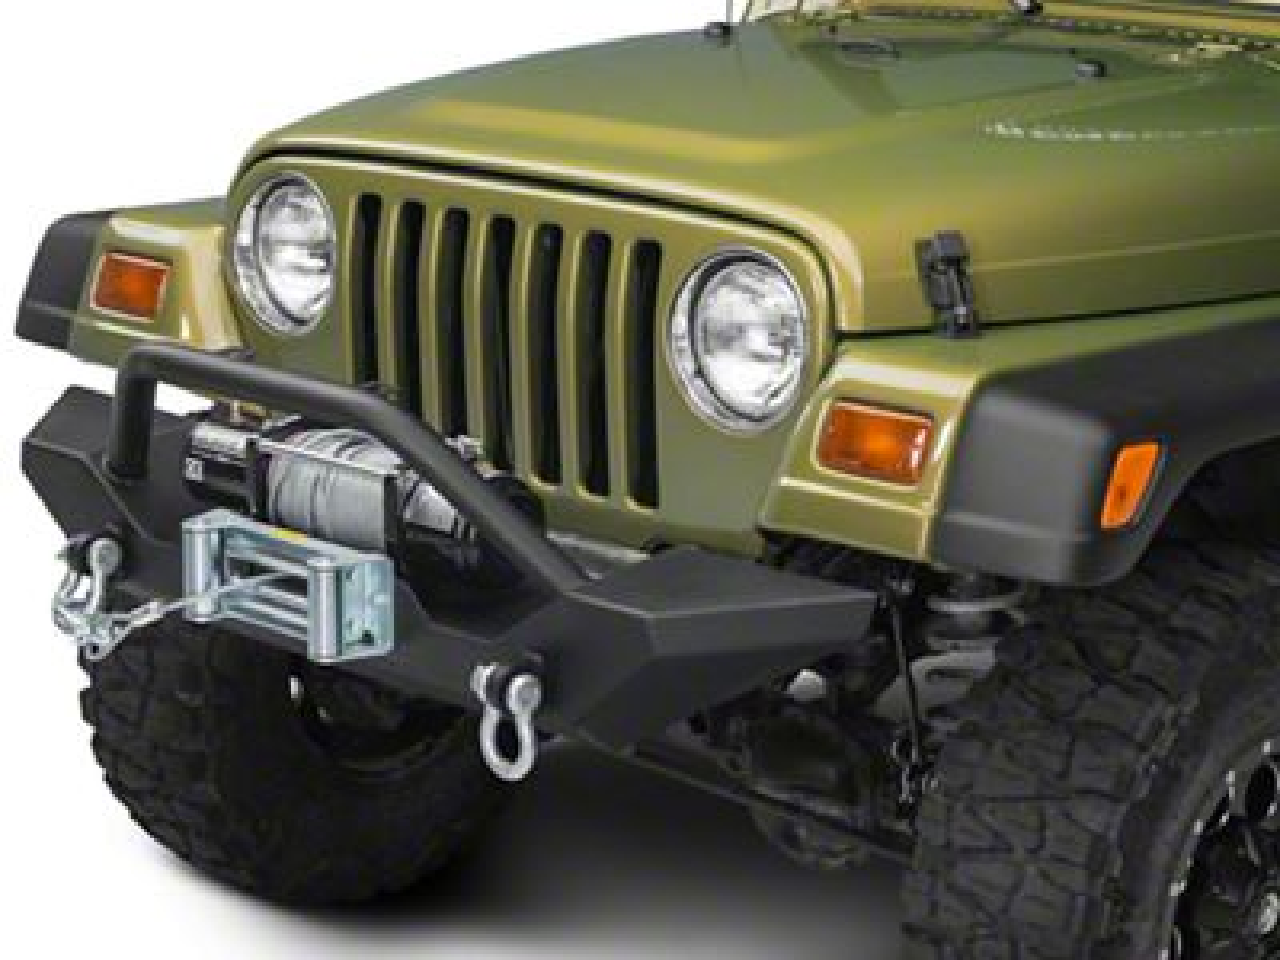 Barricade Trail Force HD Front Bumper (87-06 Jeep Wrangler YJ & TJ)